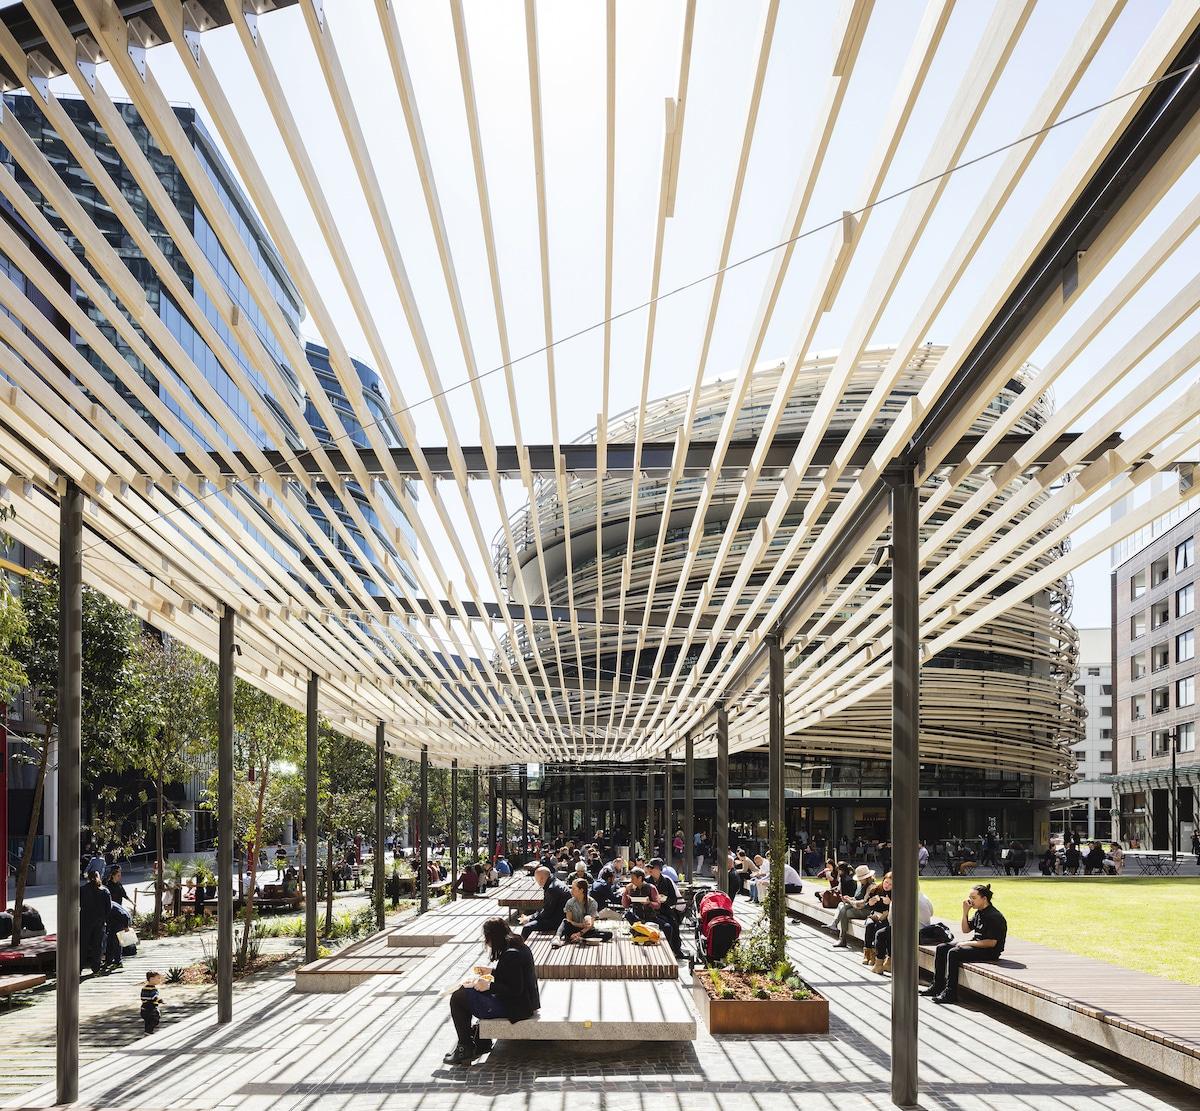 Darling Square in Sydney